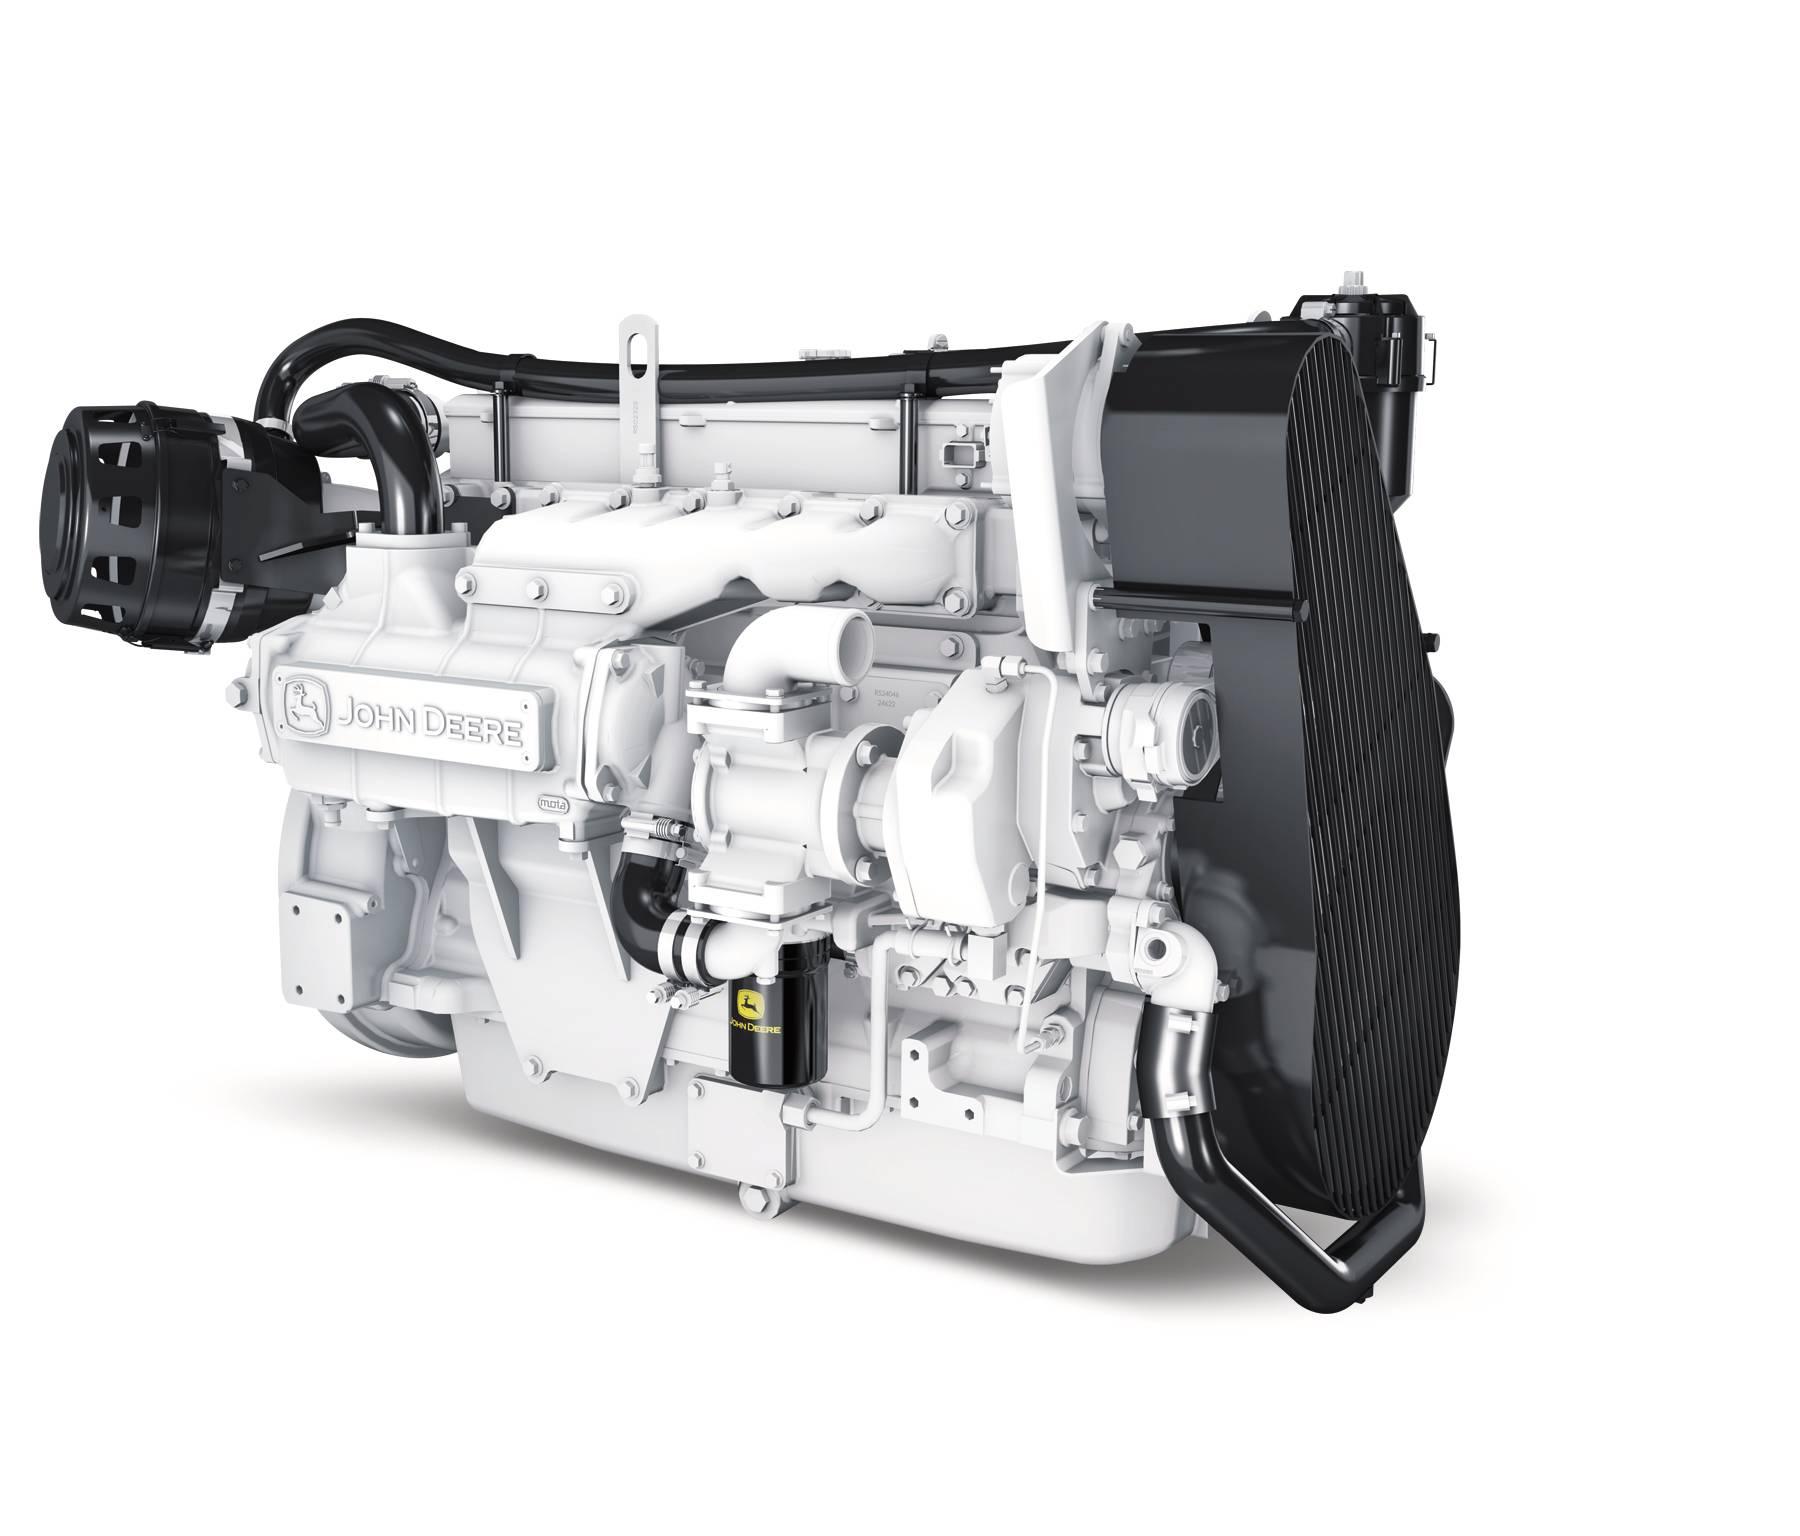 John Deere Boat : New marine engines